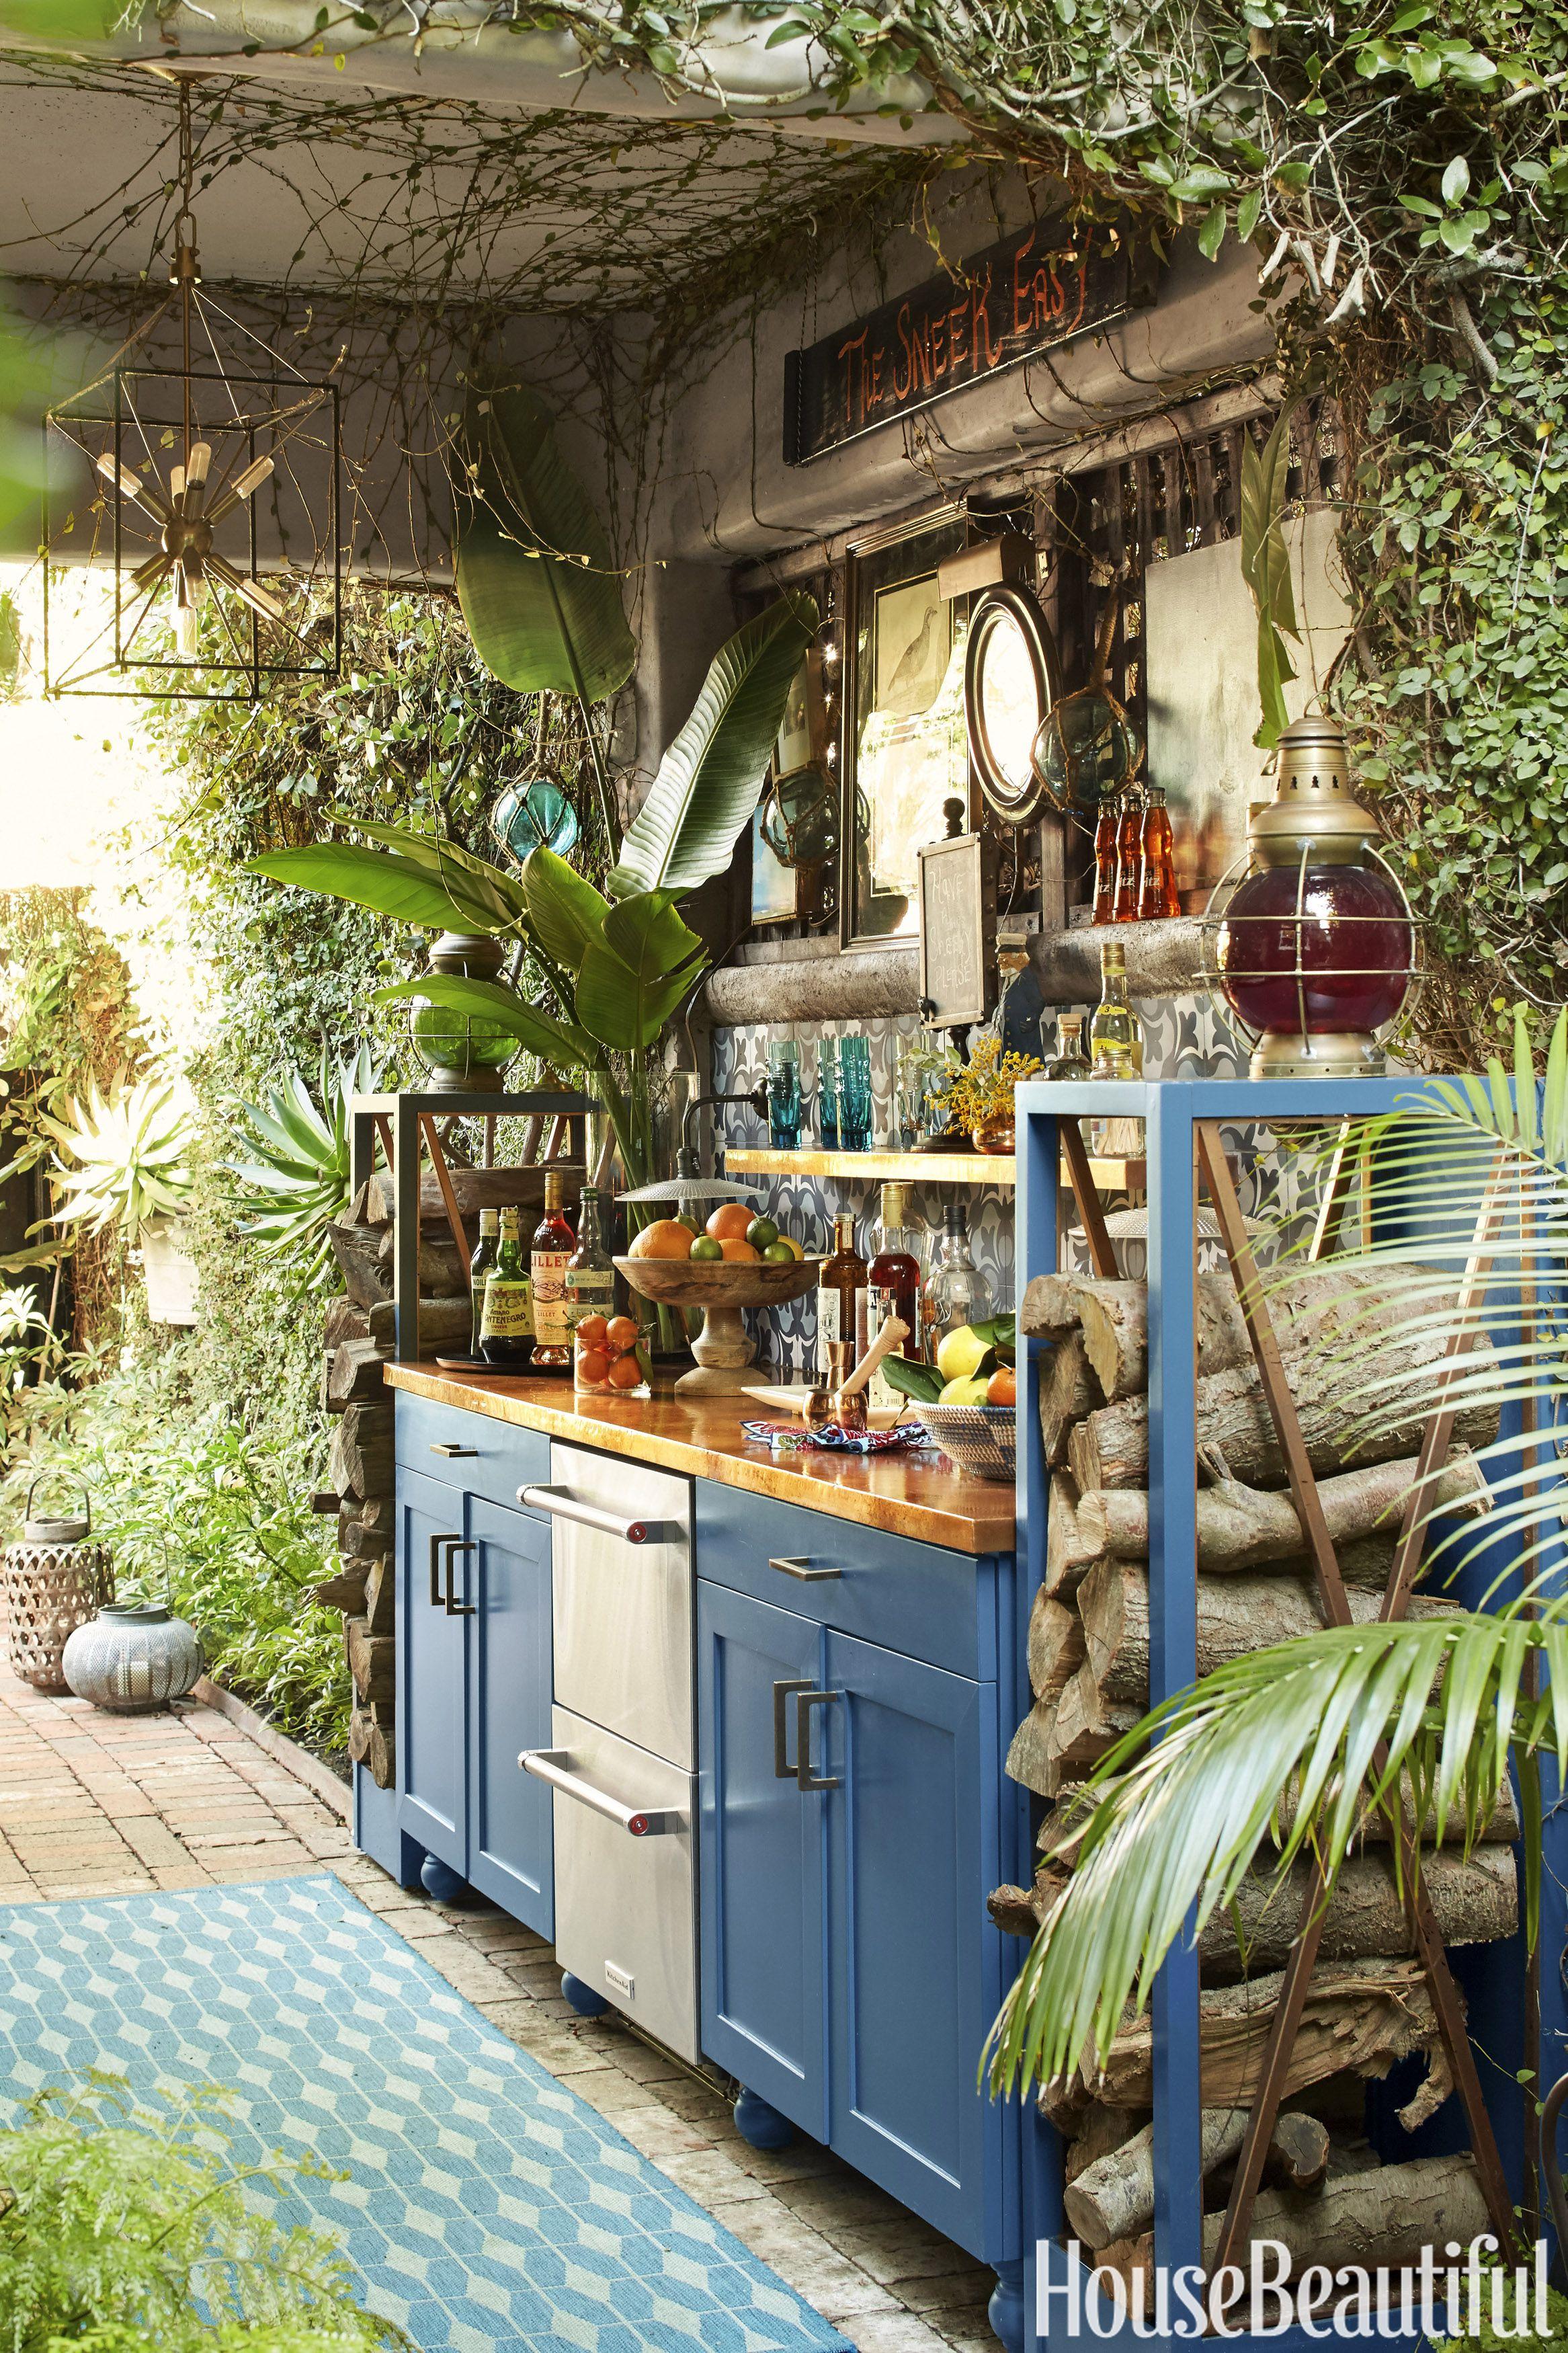 14 outdoor kitchen design ideas and pictures - al fresco kitchen styles HHUTGSM